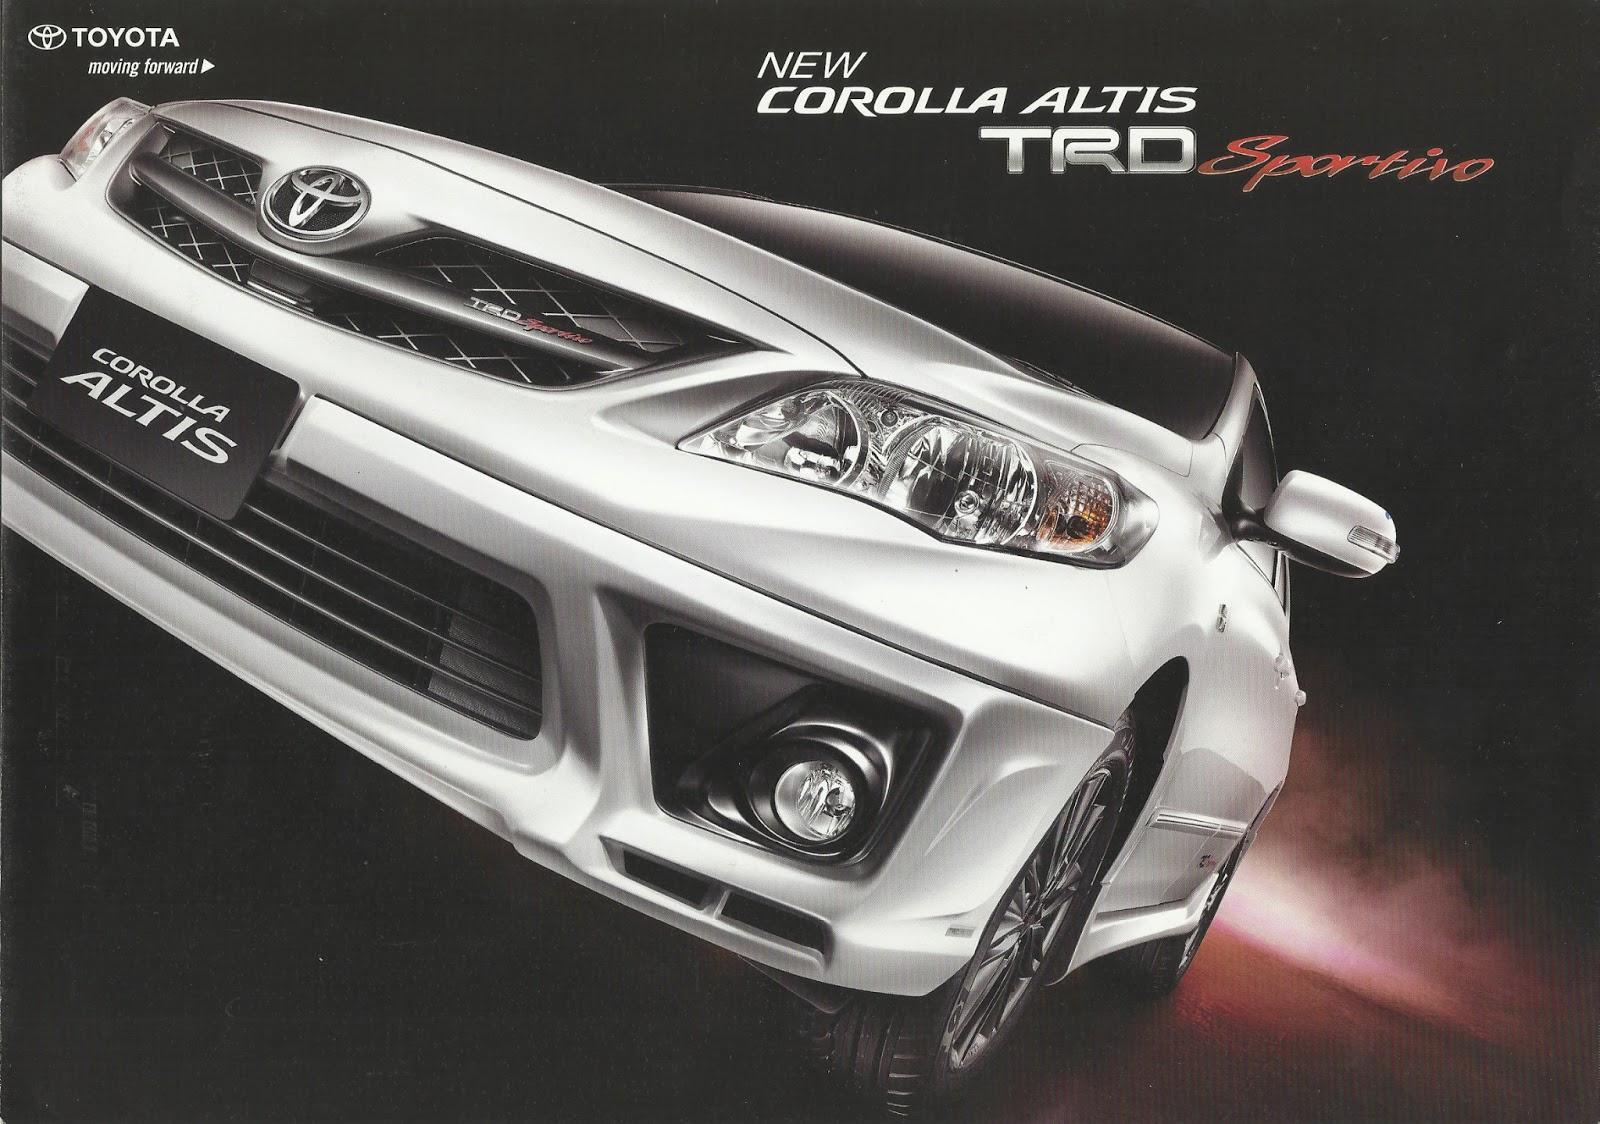 Toyota New Yaris Trd Sportivo Brand Camry 2016 Price Genuine Accessories : Corolla Altis